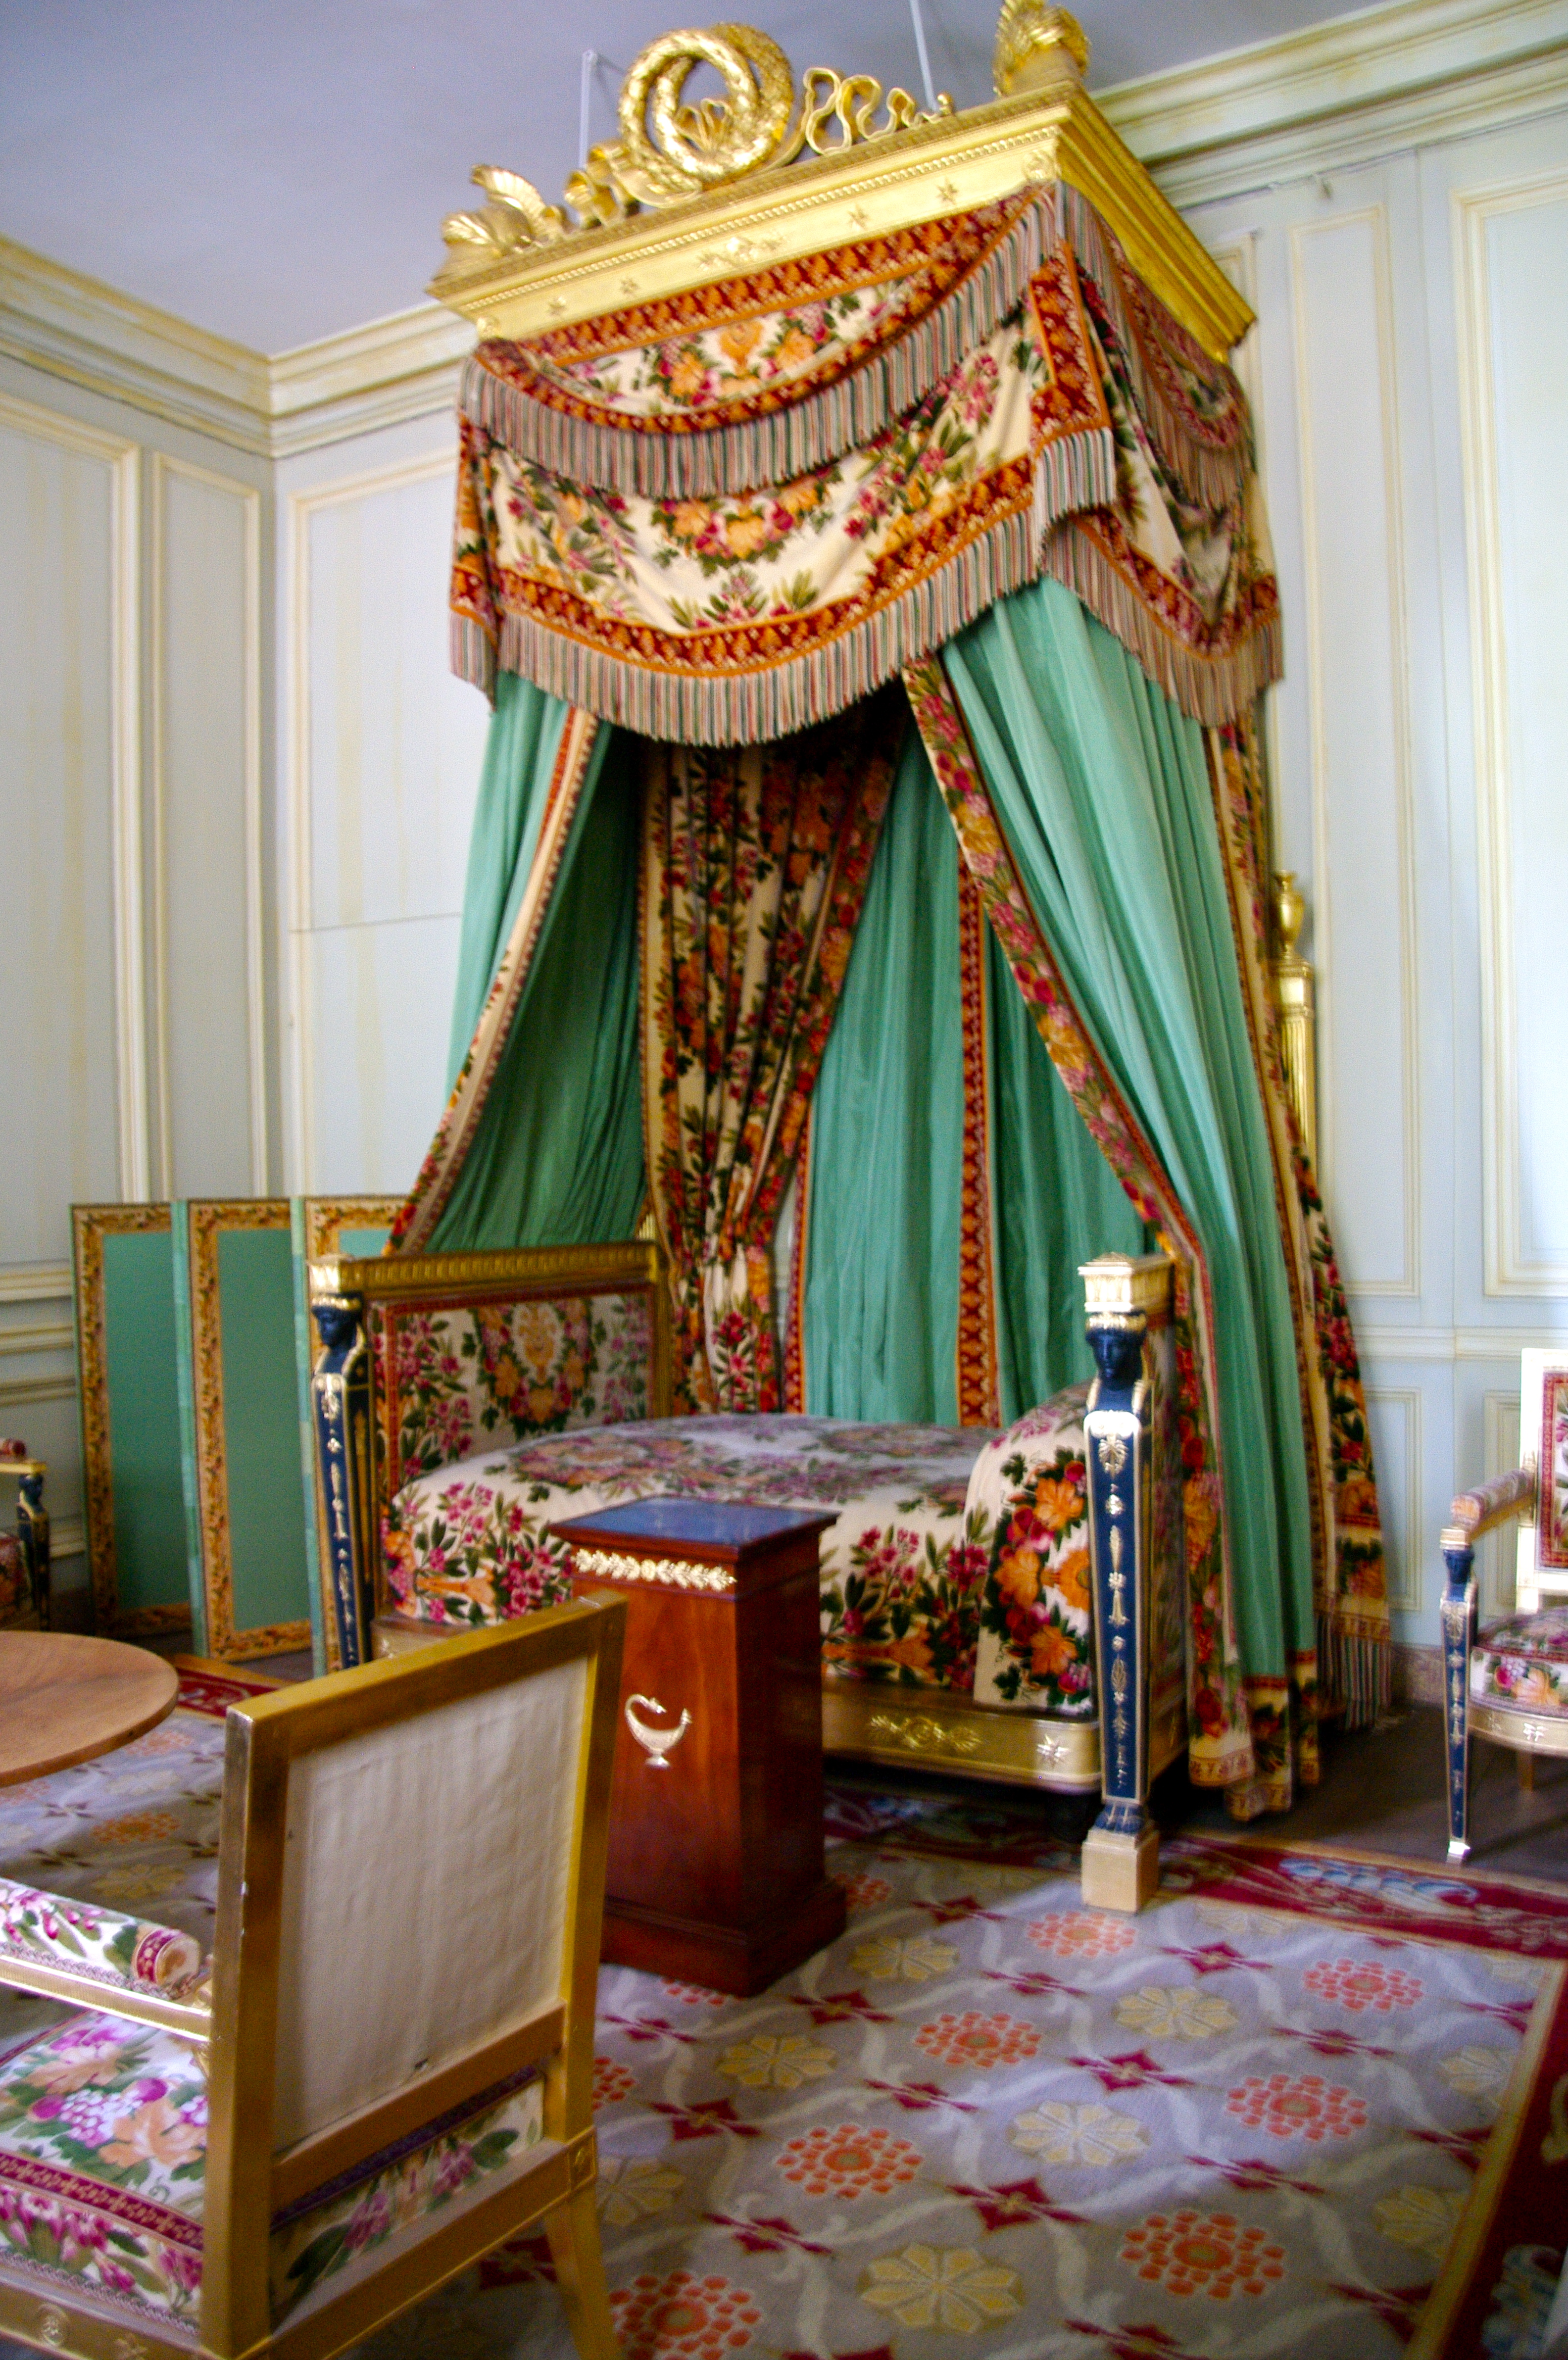 File chambre petit appartement de l 39 empereur napol on ier wikimedia commons - Foto chambre a coucher ...